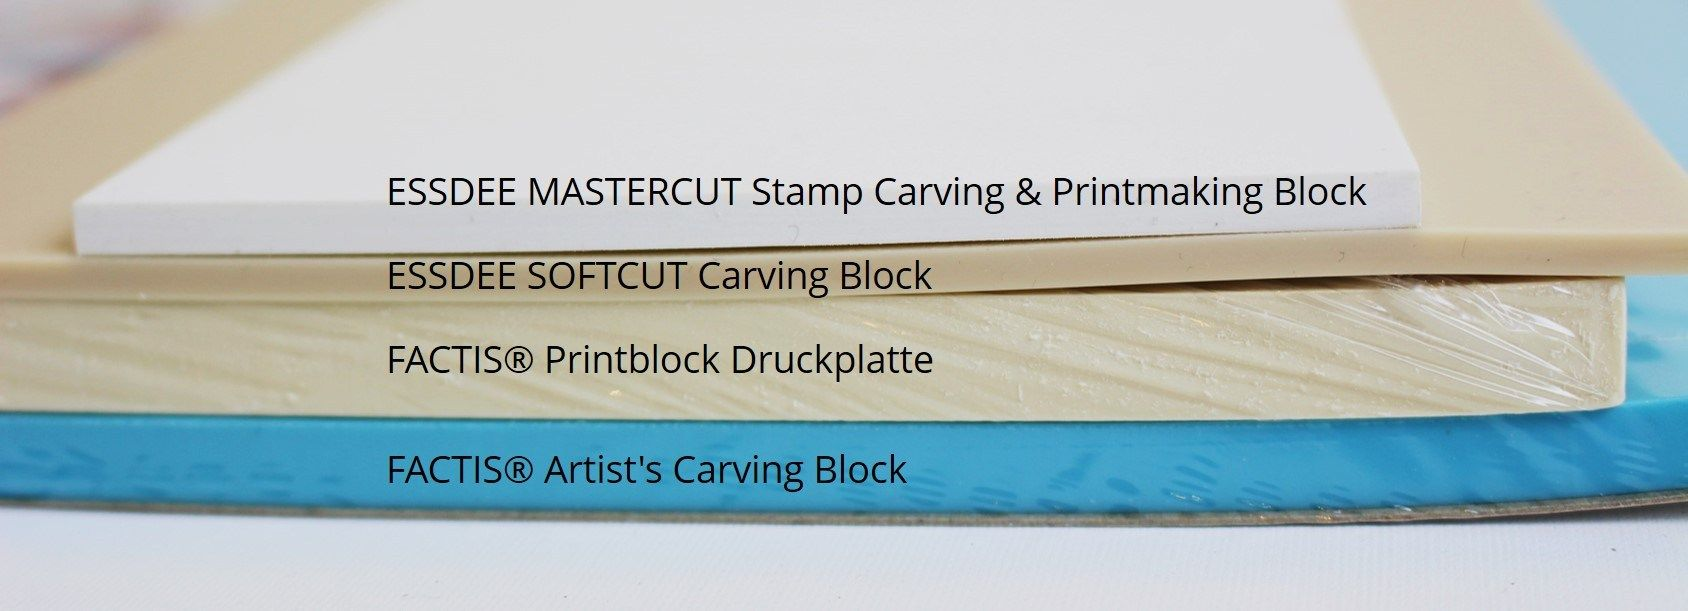 Stempelgummi für Keramik und Papier StempelgummiMaterialien